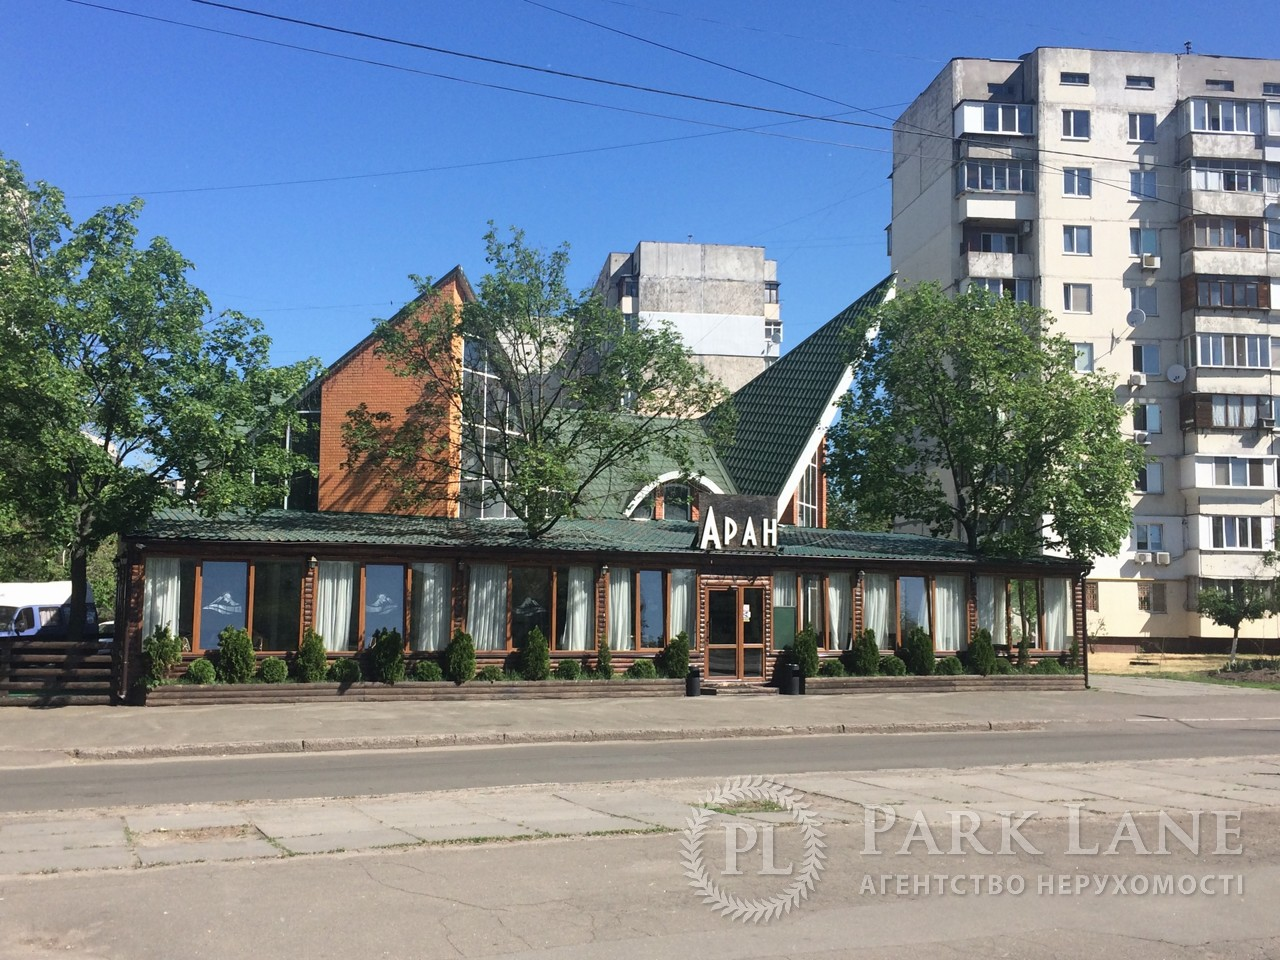 Ресторан, J-25790, Приозерная, Киев - Фото 1